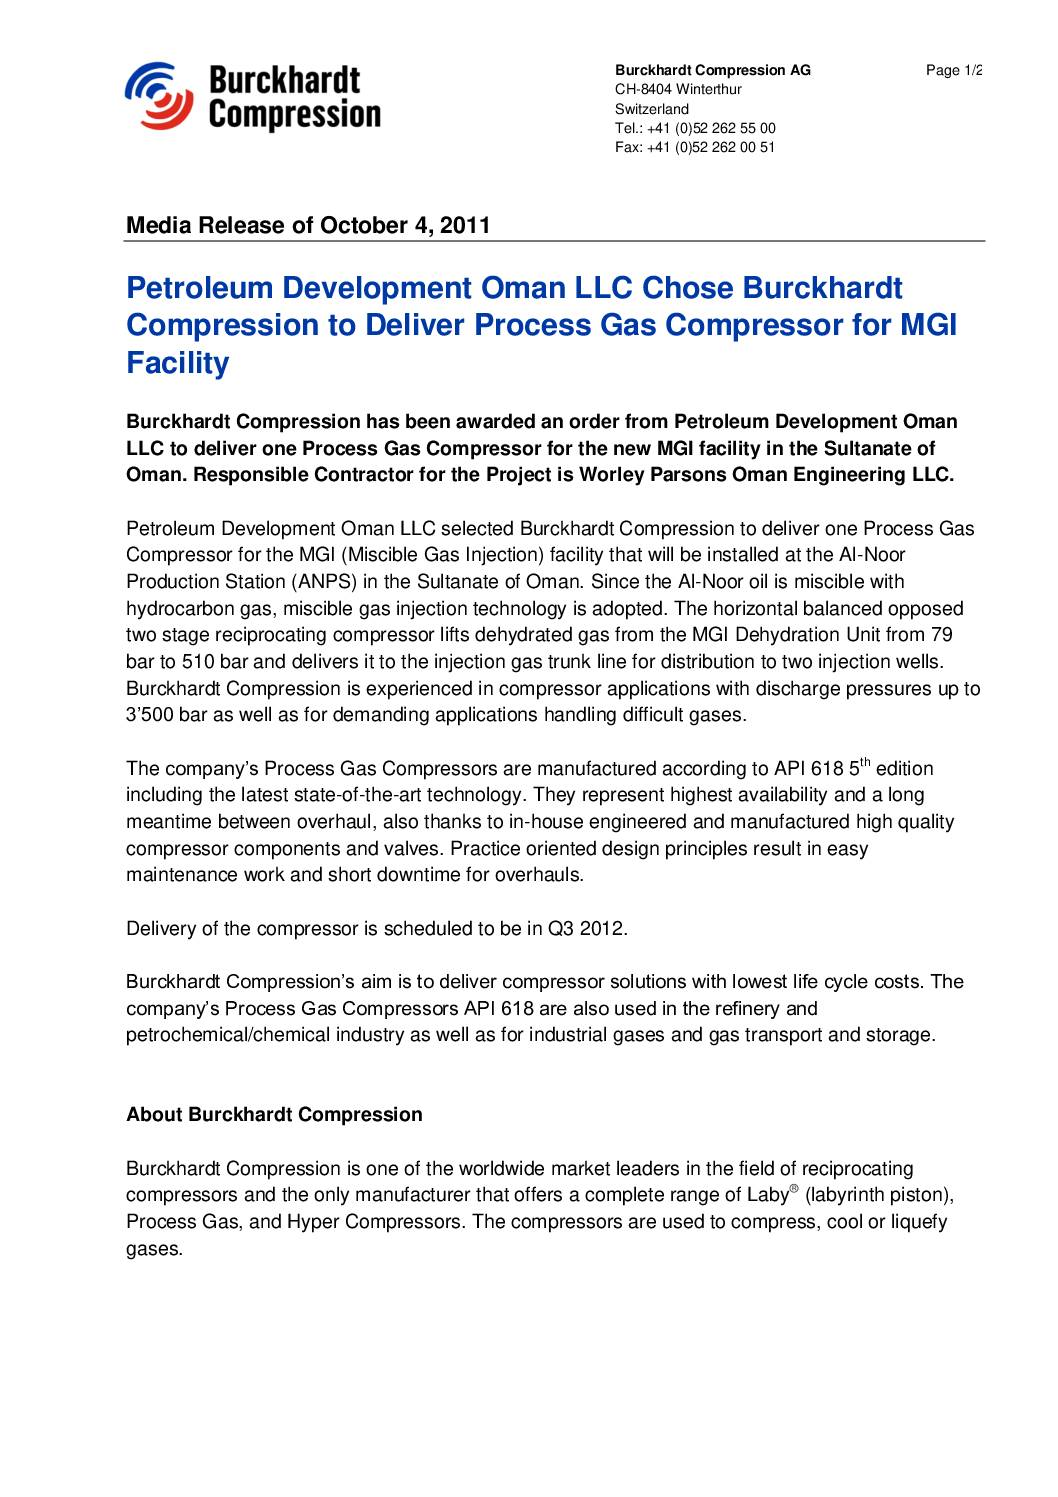 Petroleum Development Oman LLC Chose Burckhardt Compression